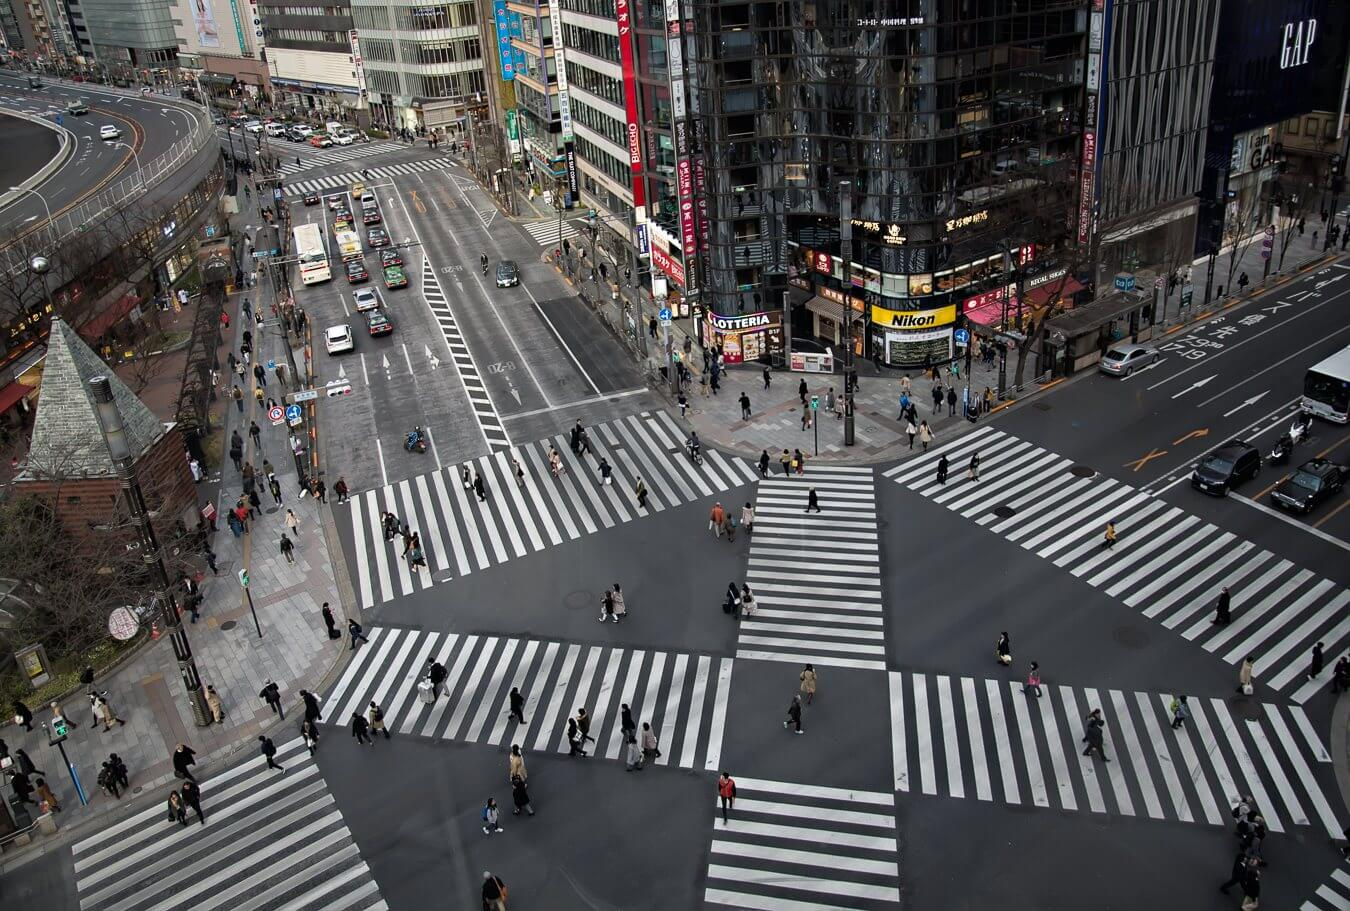 Ginza, Tokyo, Japan - Photo by Zed Sindelar of CuriousZed Photography